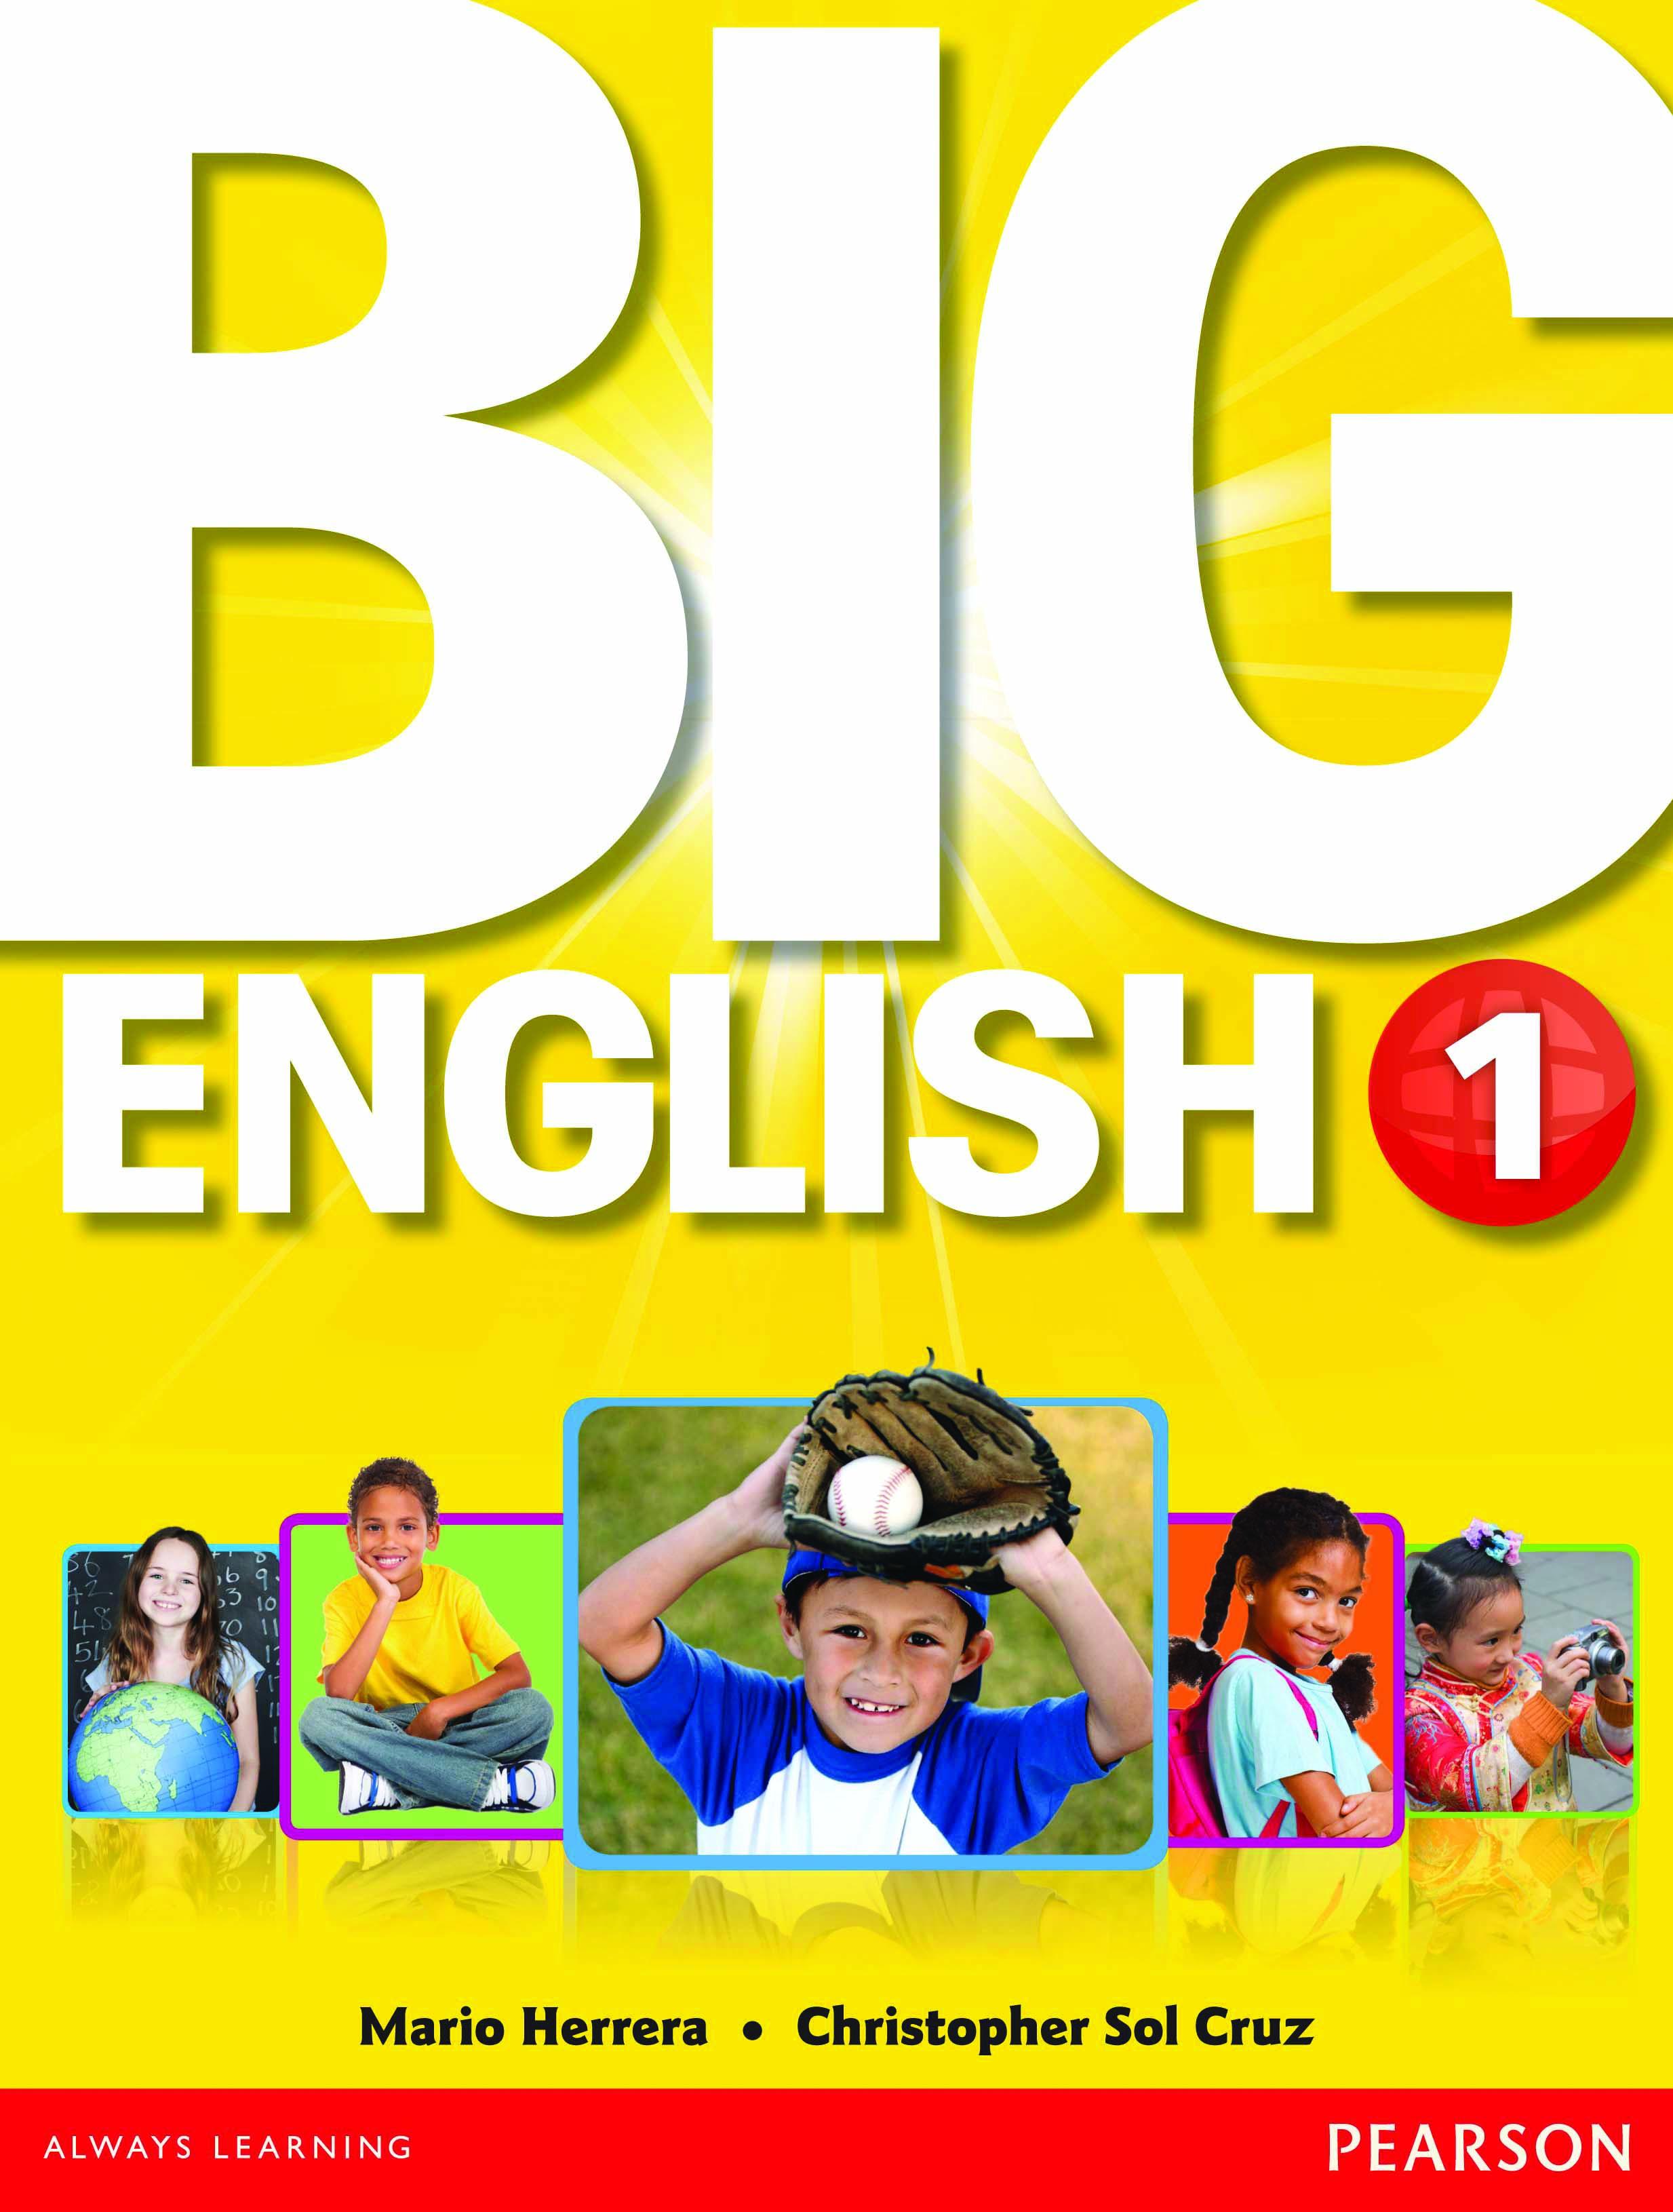 Beeno 1 Teacher's Guide (English), englishbooks jp Online